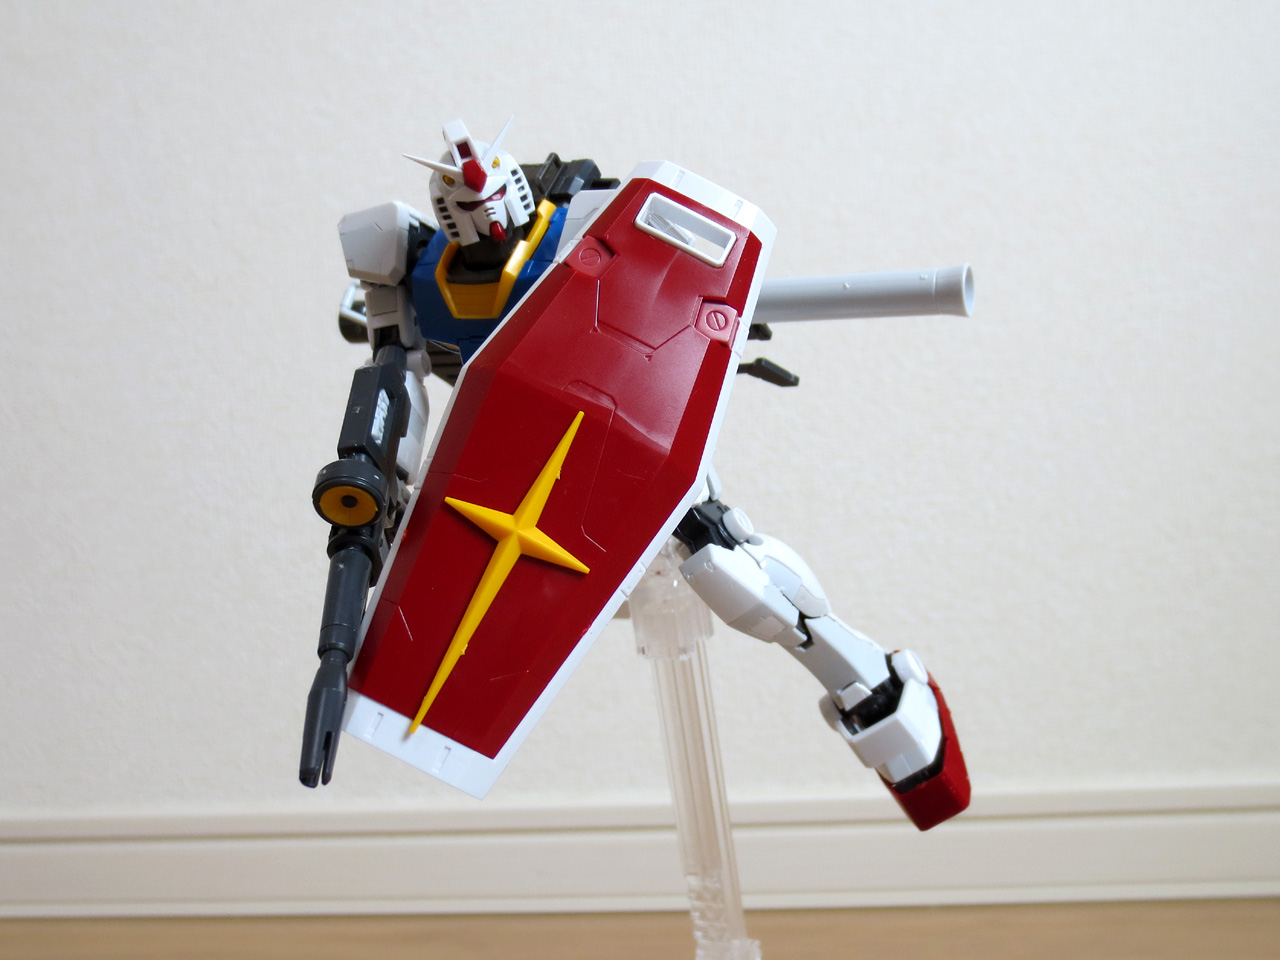 RG_RX78_2_Gundam_29.jpg